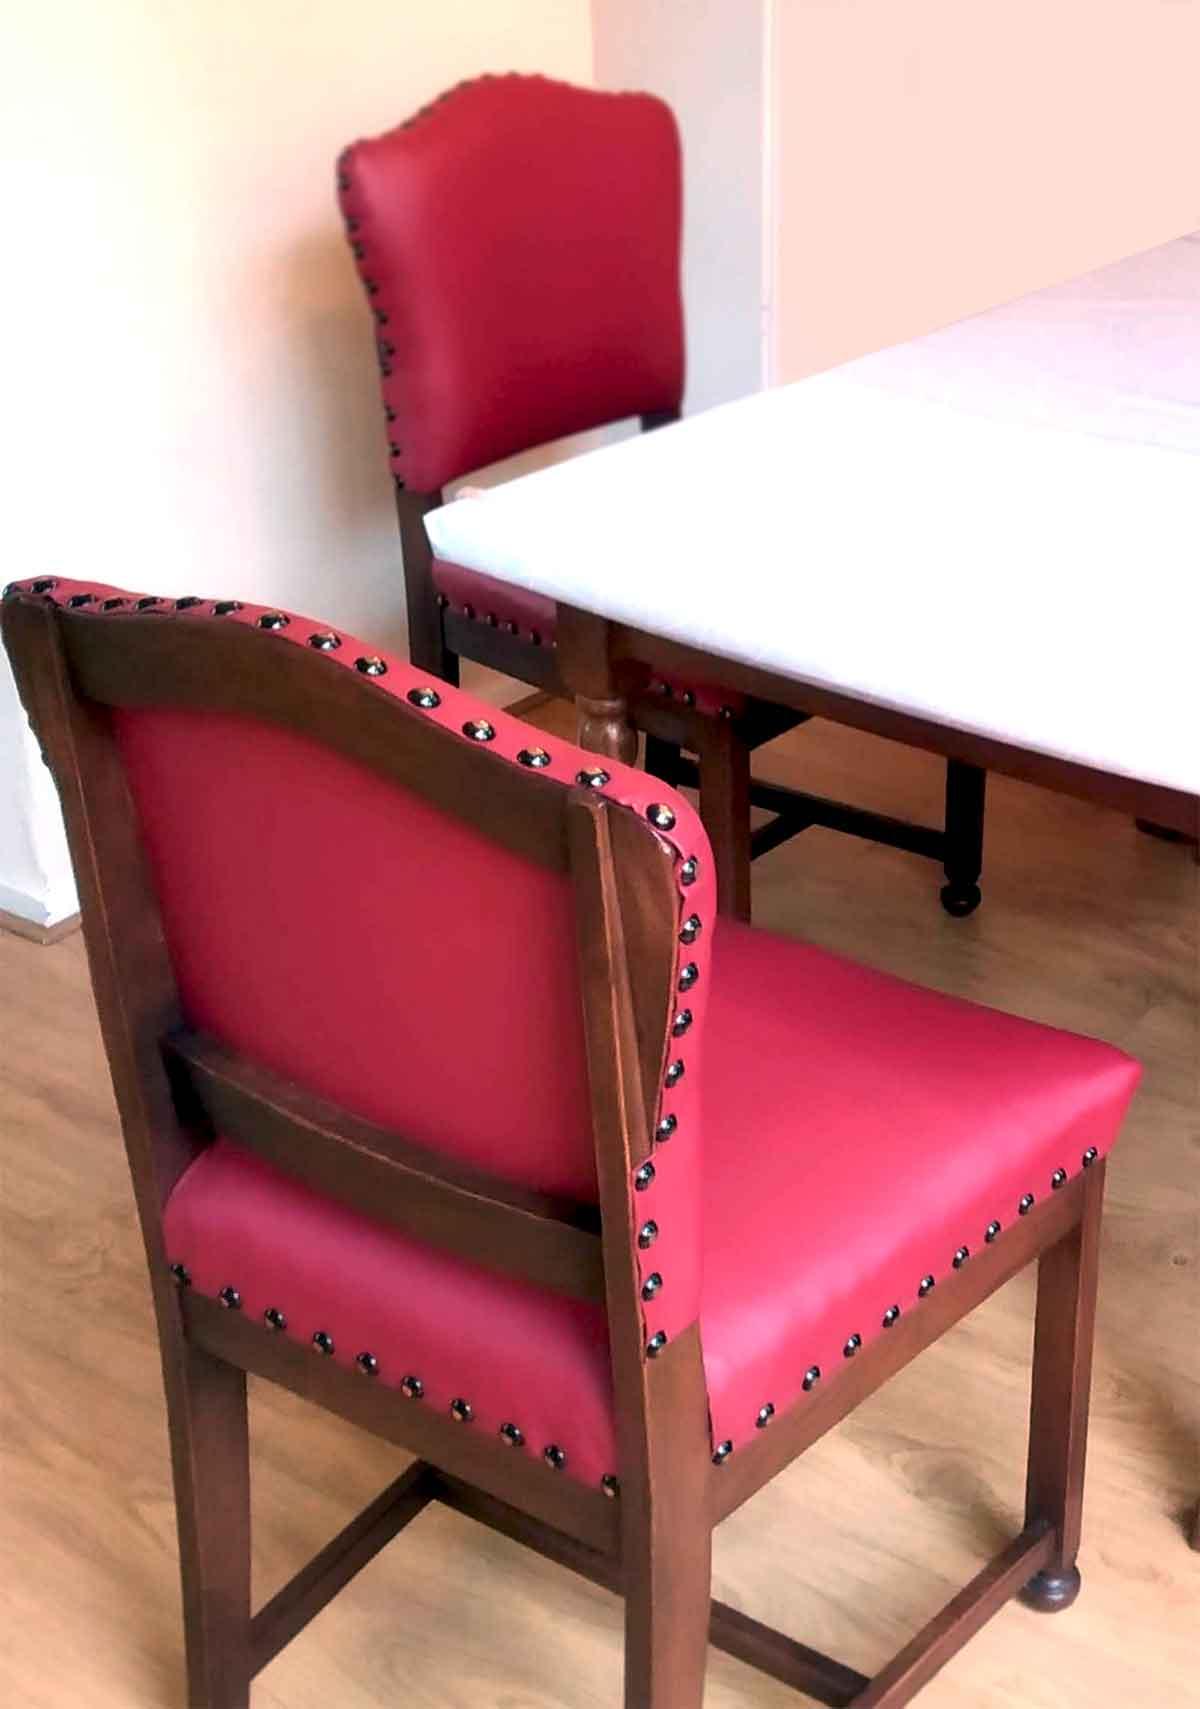 rode ouderwetse stoelenset bekleed met leer door Anita Pareldesign